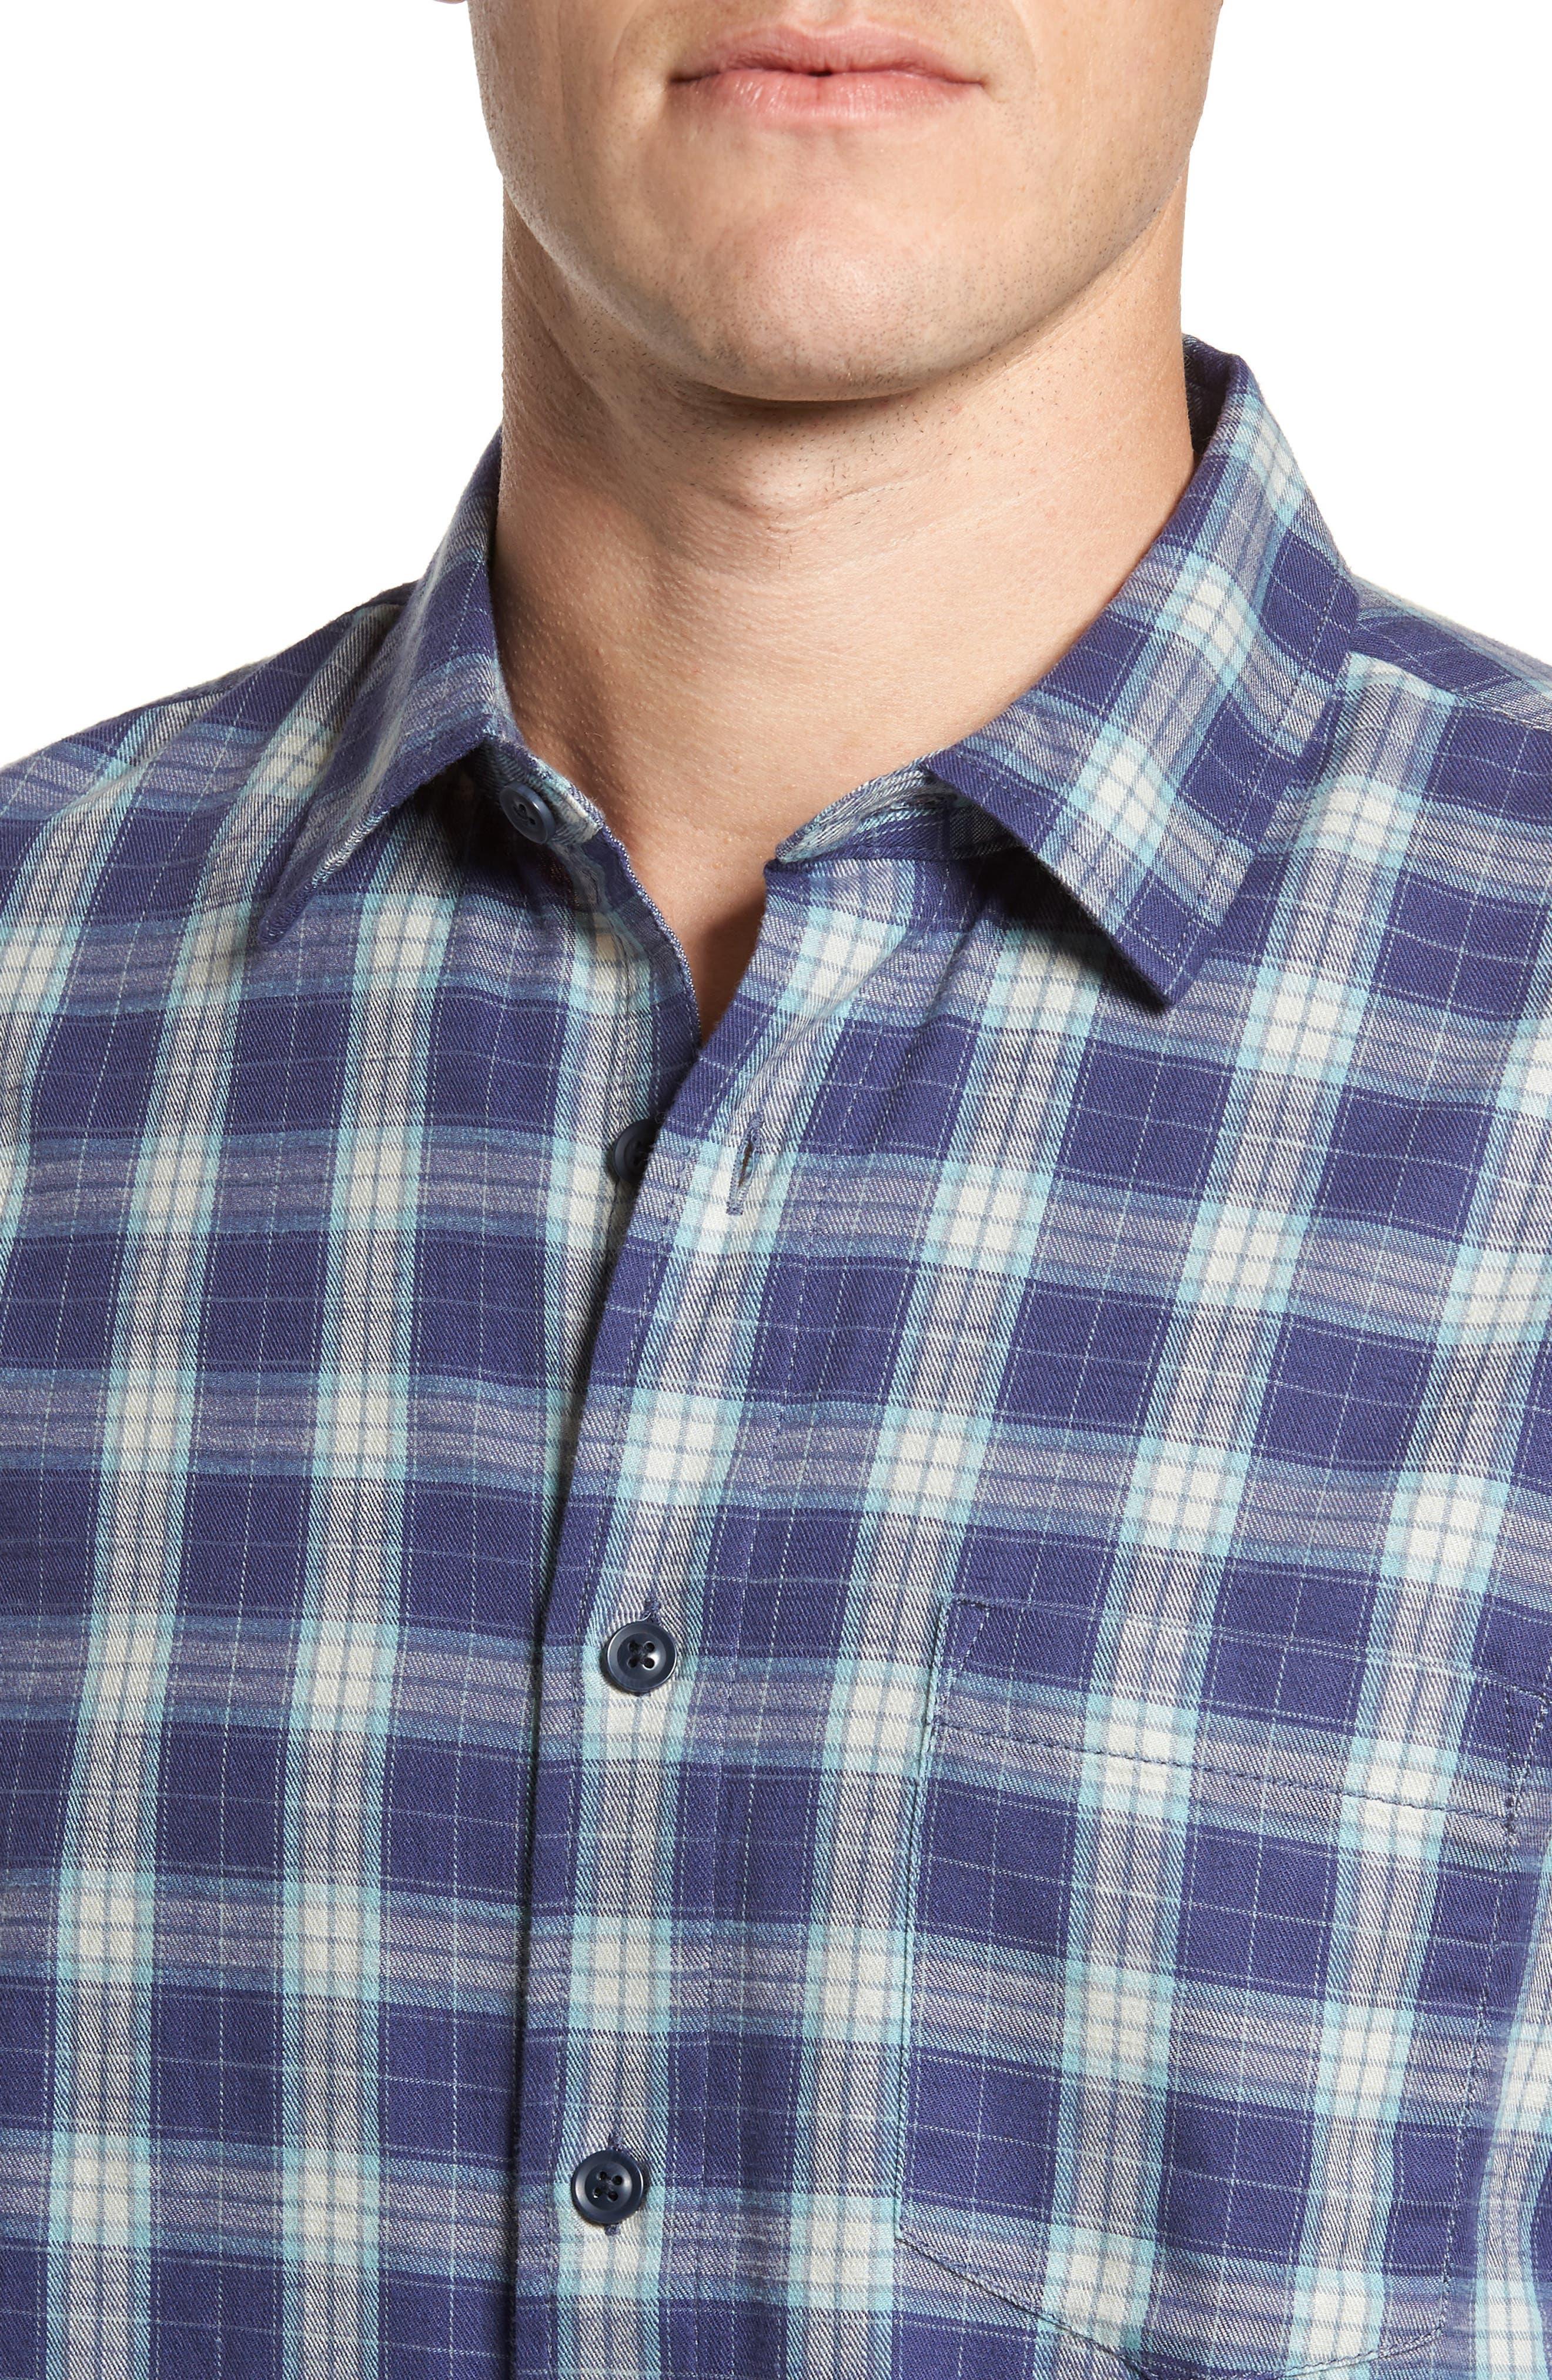 Walden Slim Fit Plaid Slub Twill Sport Shirt,                             Alternate thumbnail 4, color,                             Seafoam